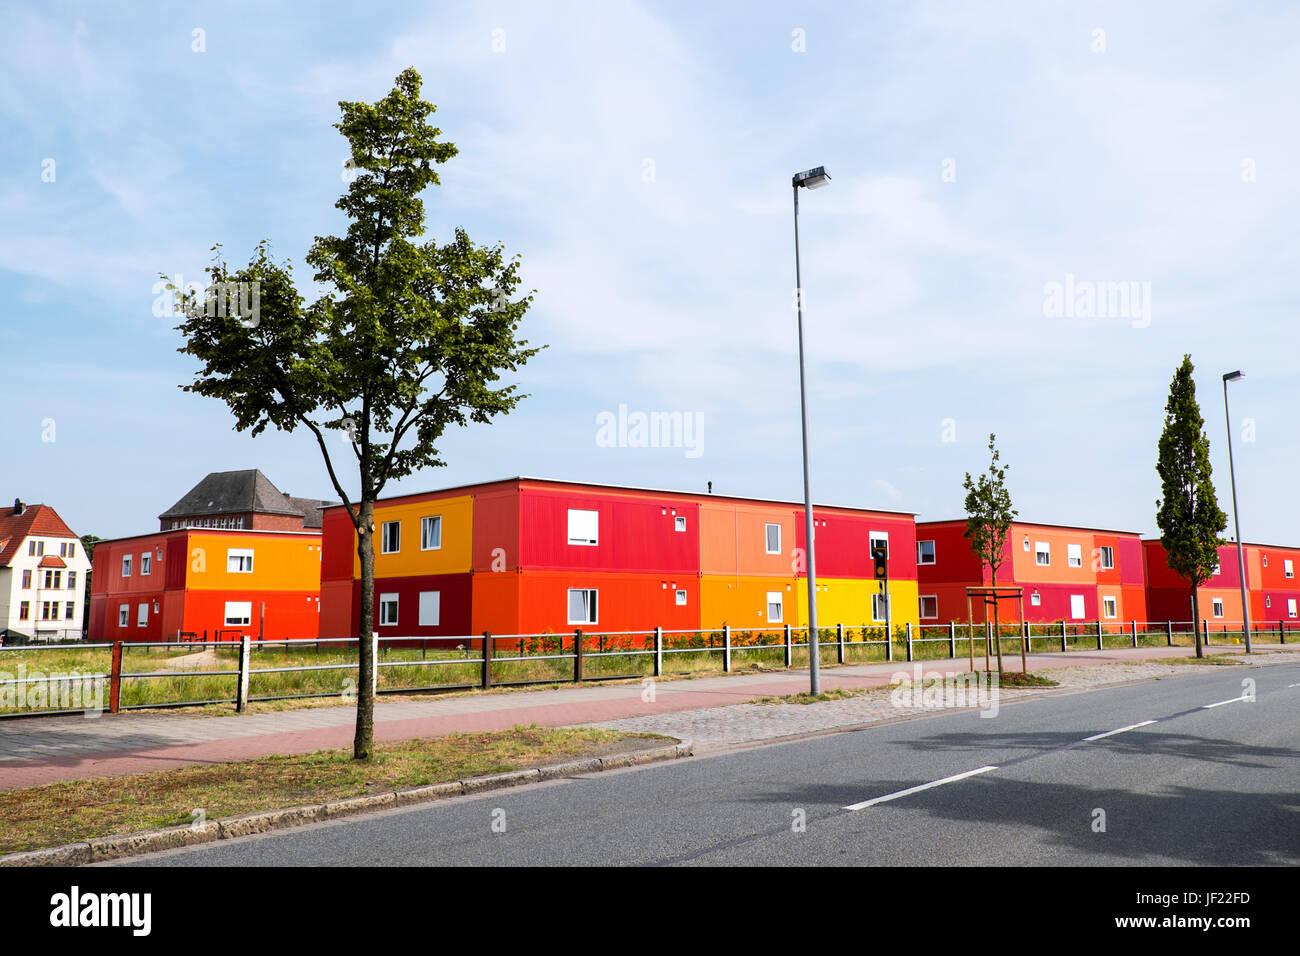 Wohncontainer Flüchtlingsdorf - Stock Image